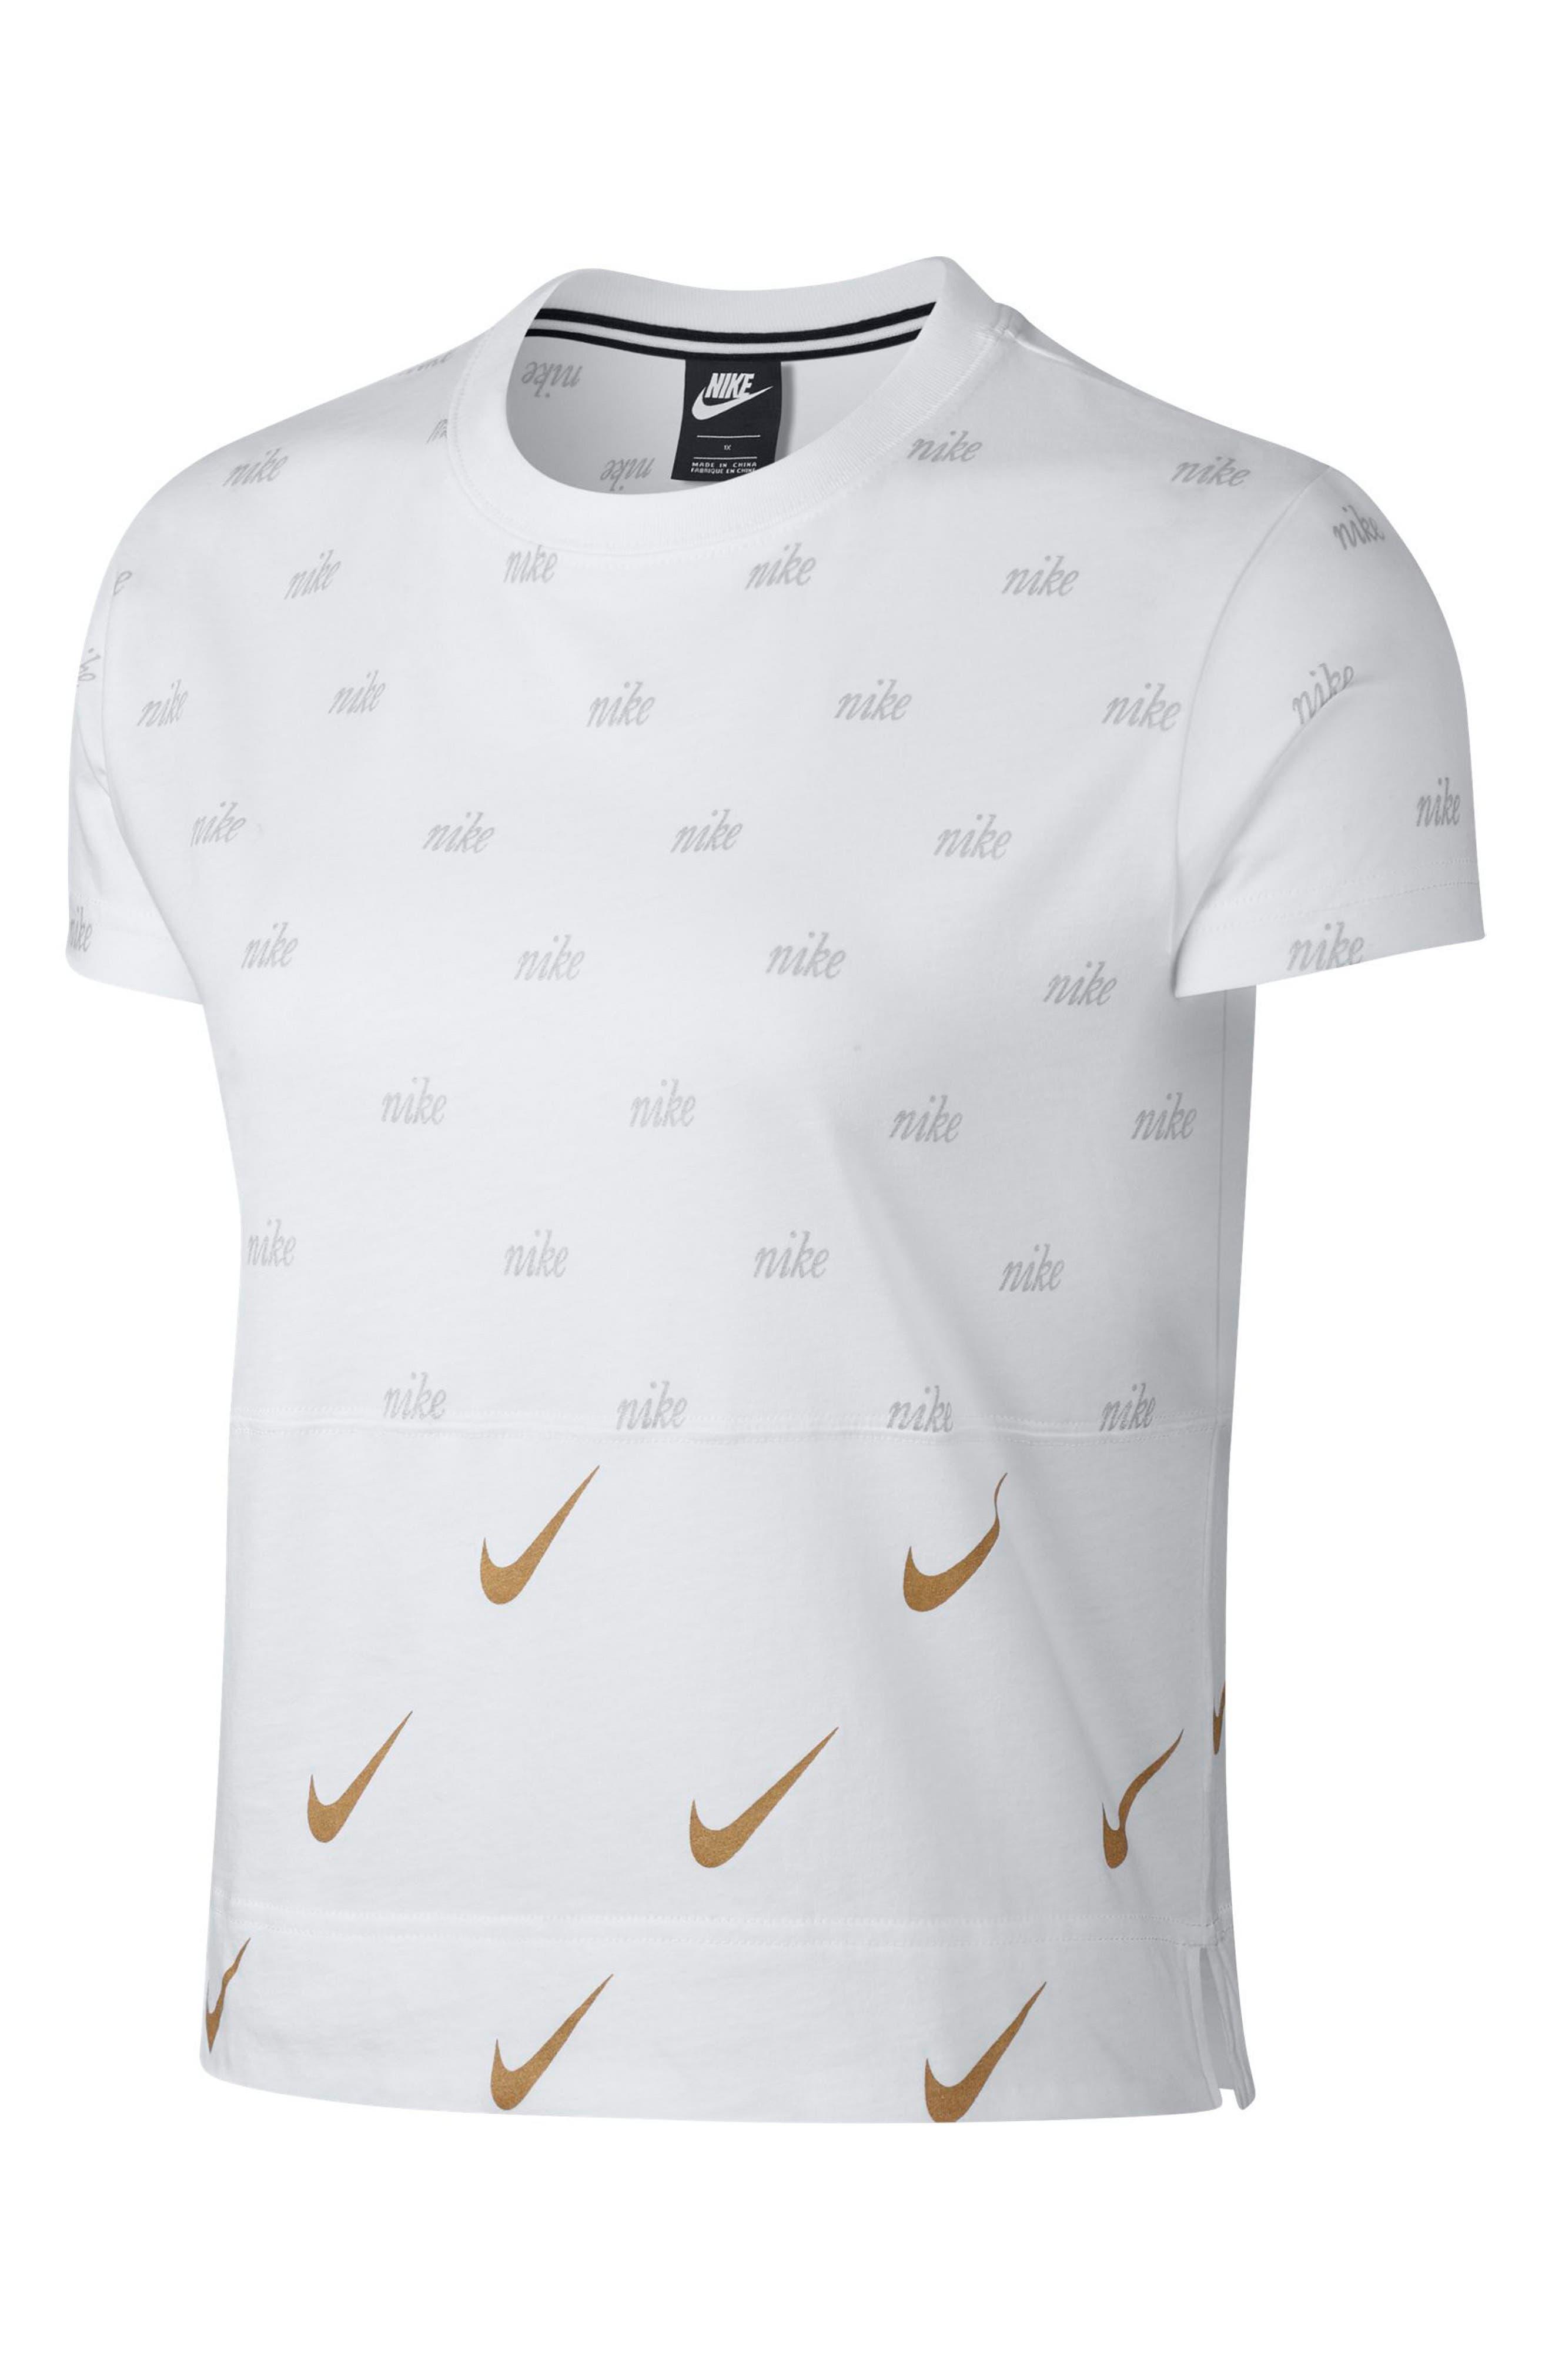 new style 34638 f412d Nike Clothing For Nordstrom Women White 6URx0R